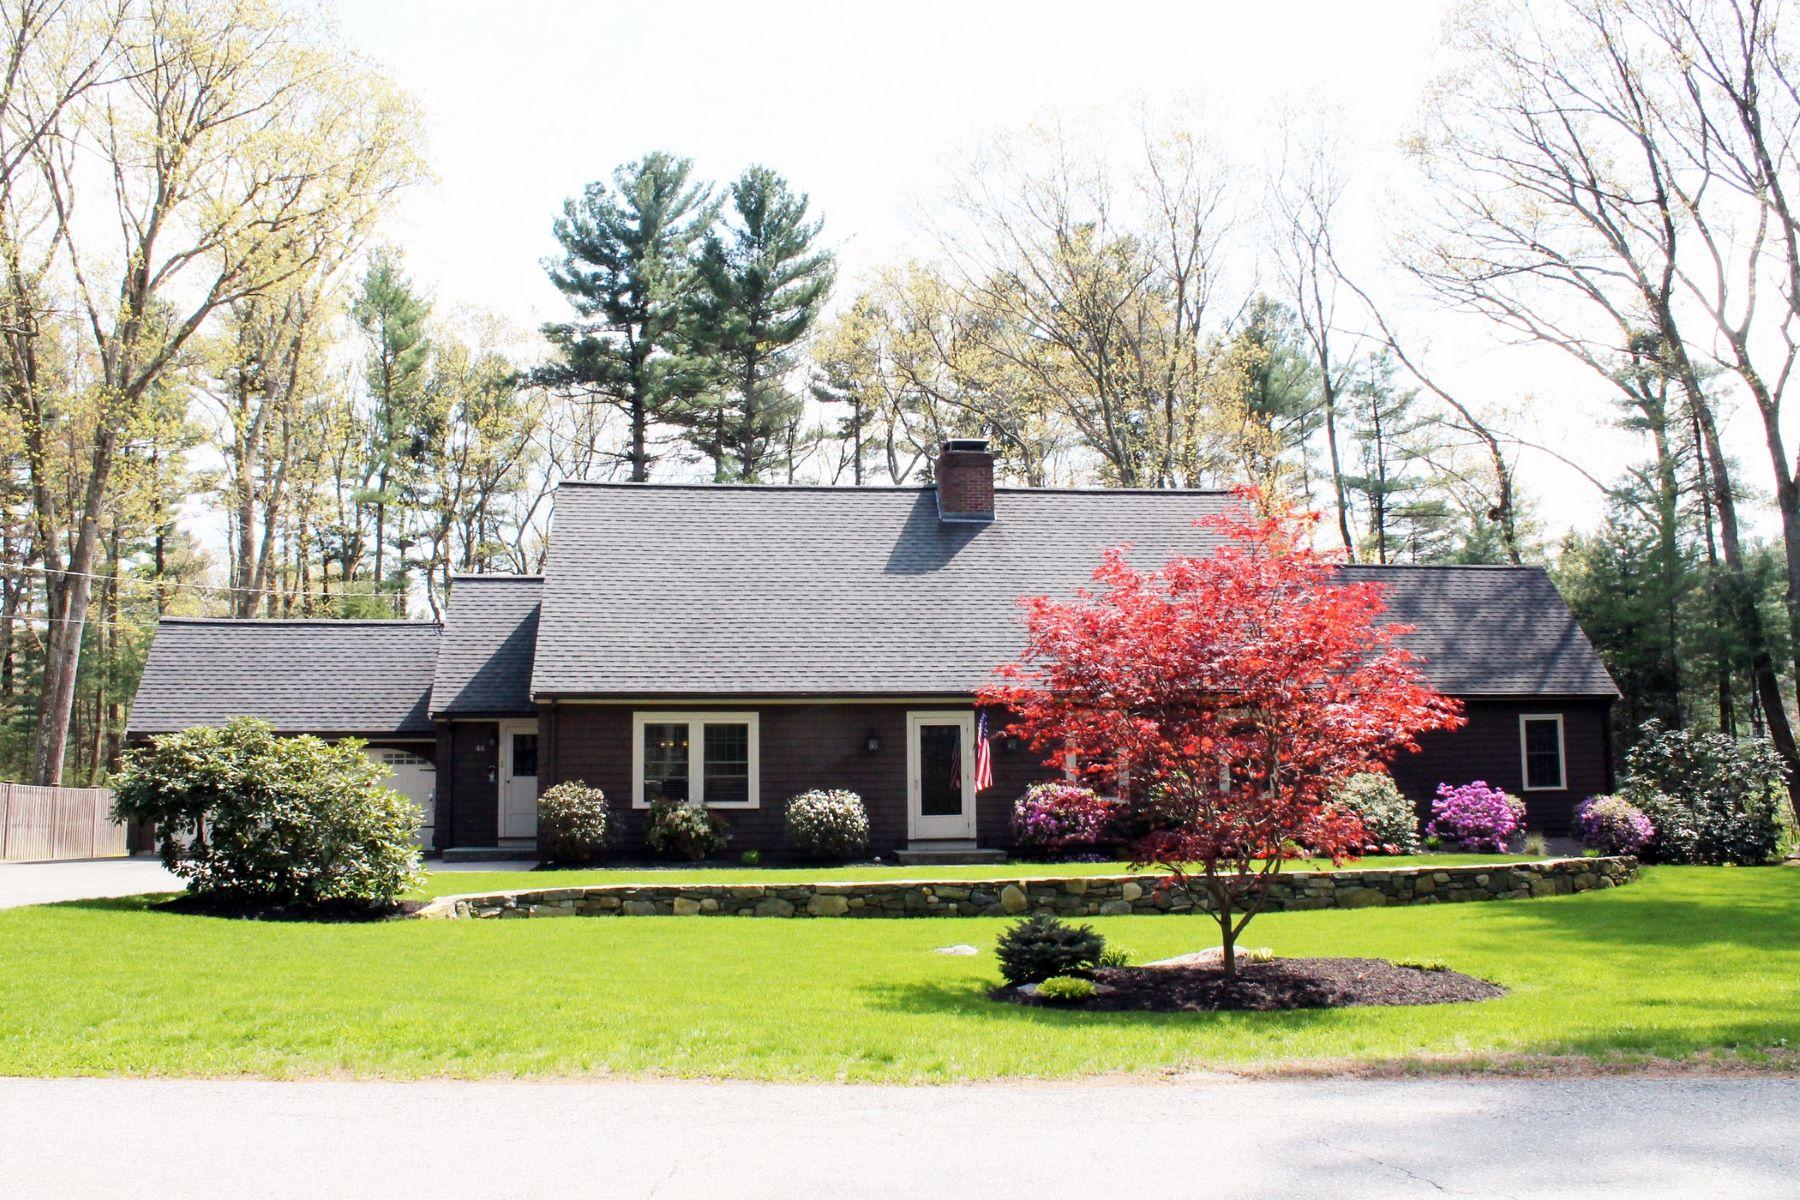 Single Family Home for Active at 46 Hayden Lane, Bedford 46 Hayden Ln Bedford, Massachusetts 01730 United States